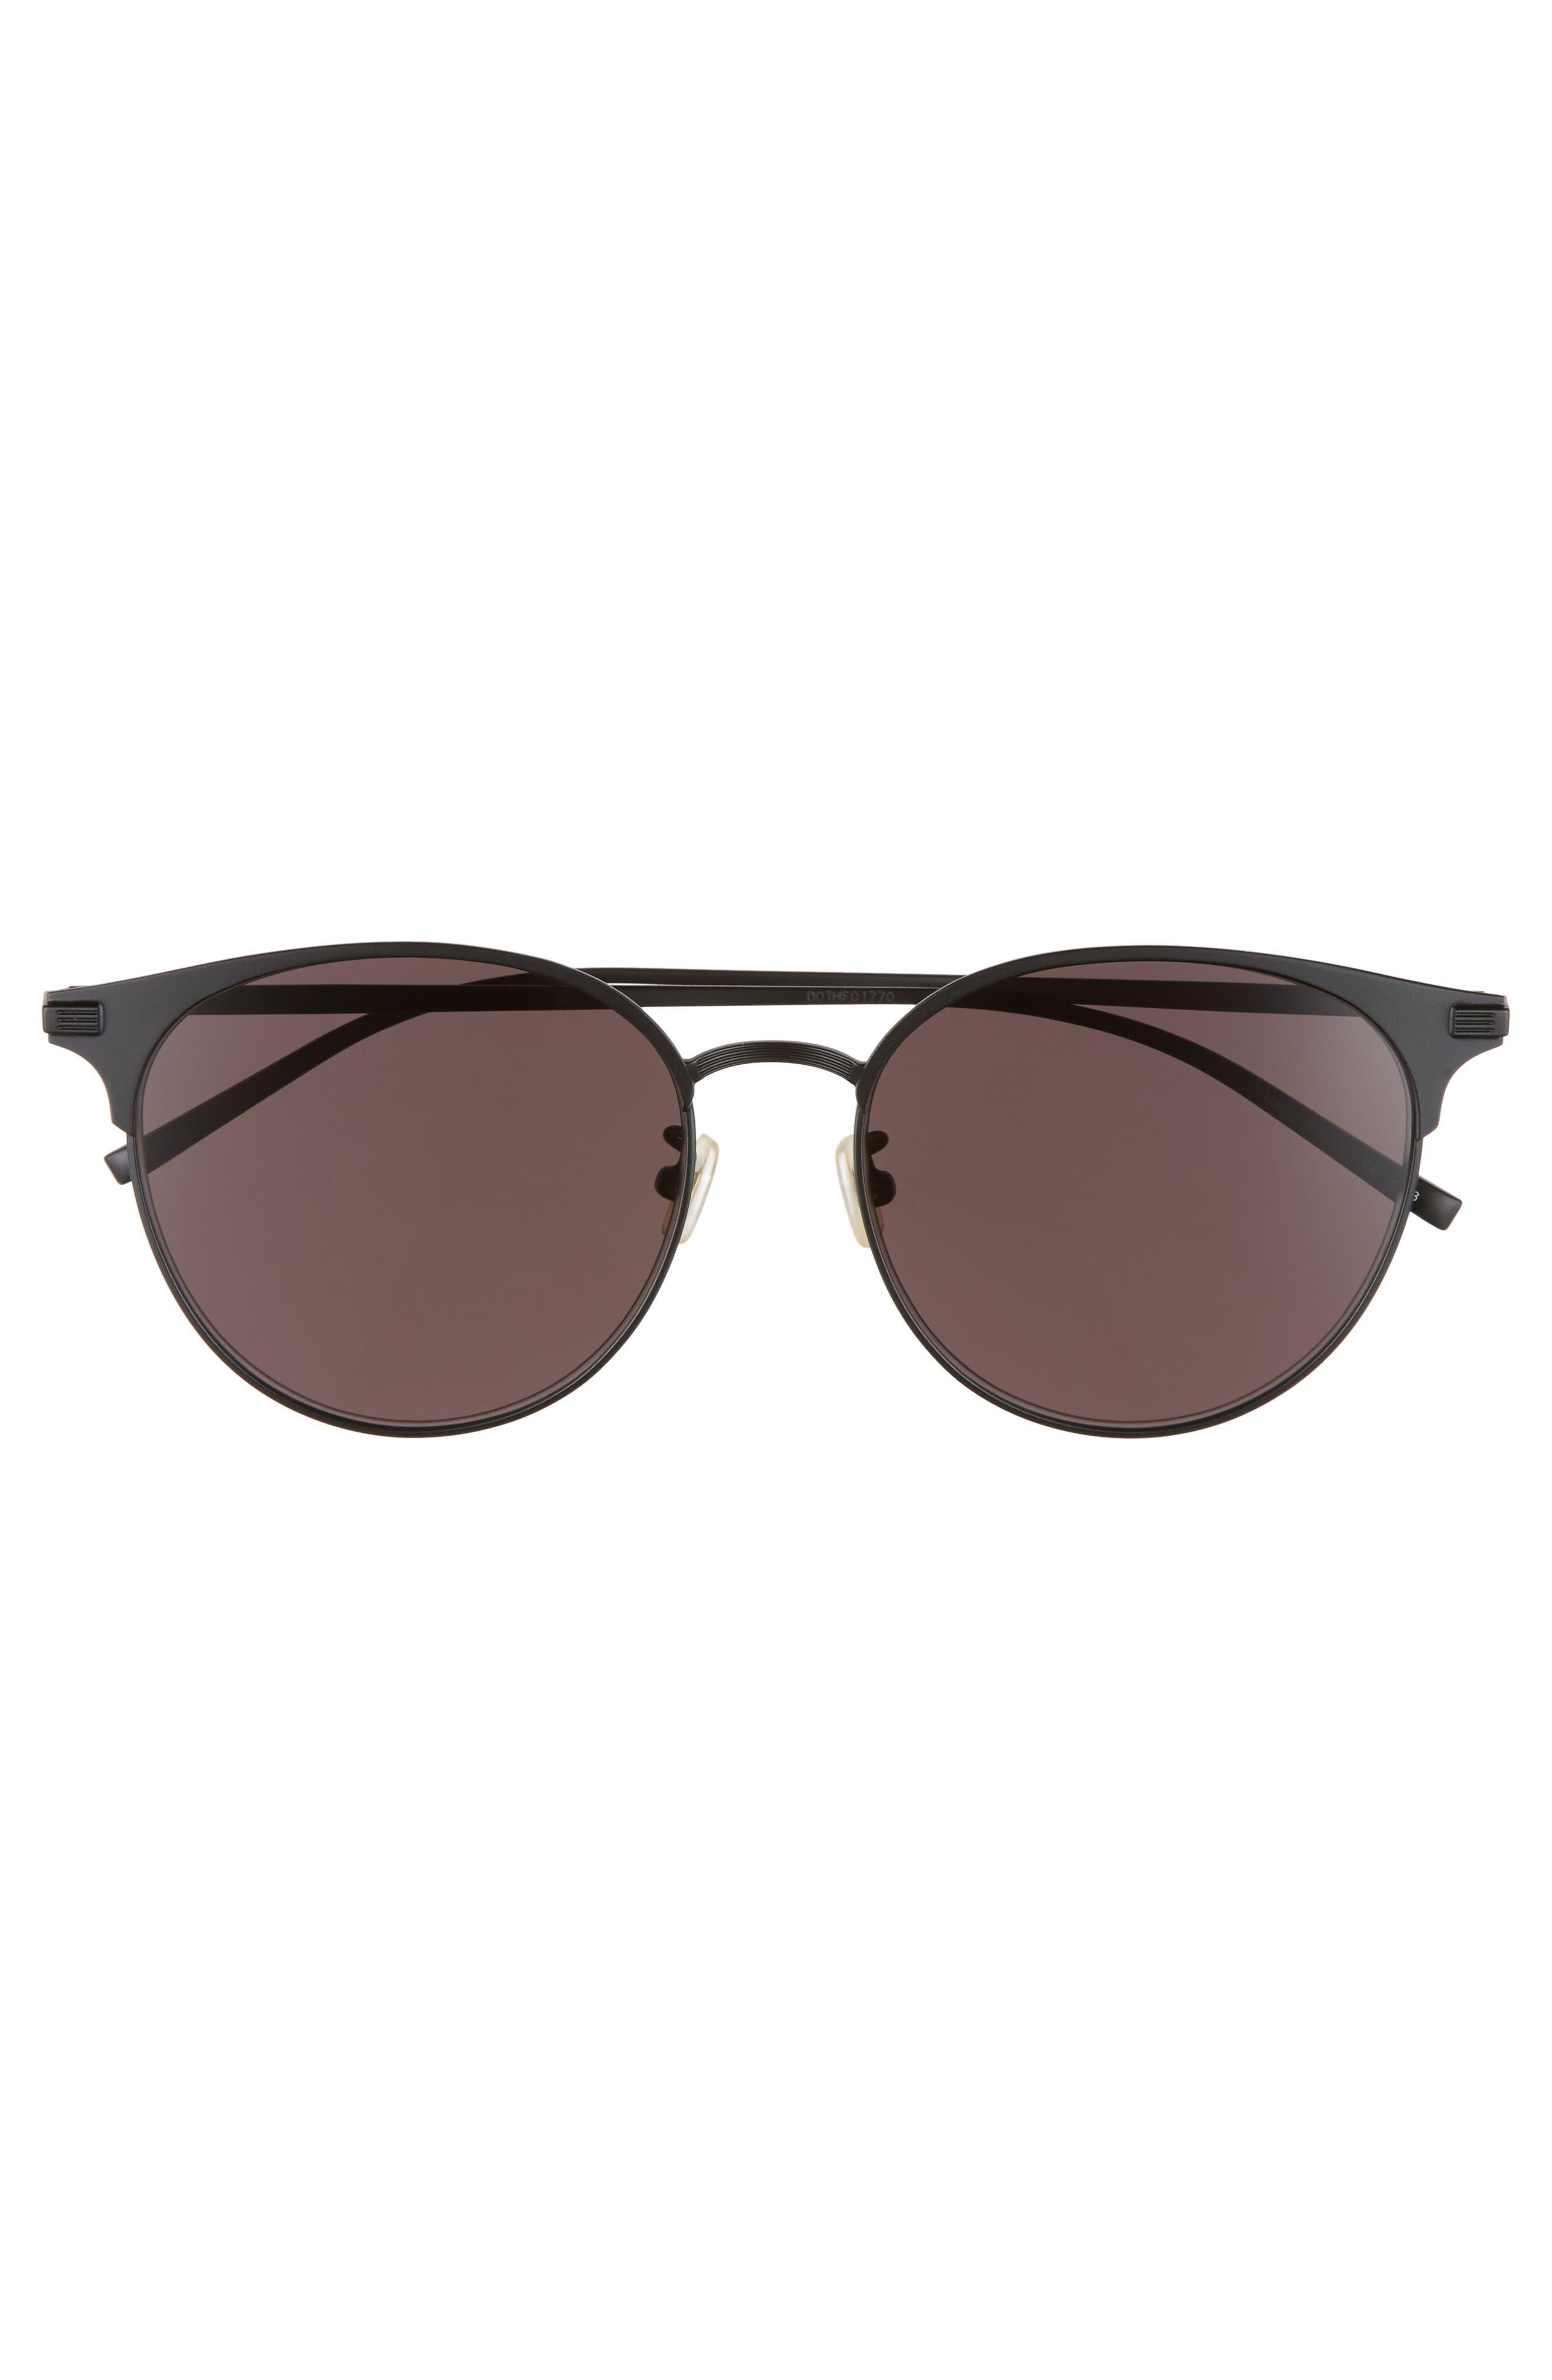 57mm Sunglasses,                             Alternate thumbnail 3, color,                             BLACK